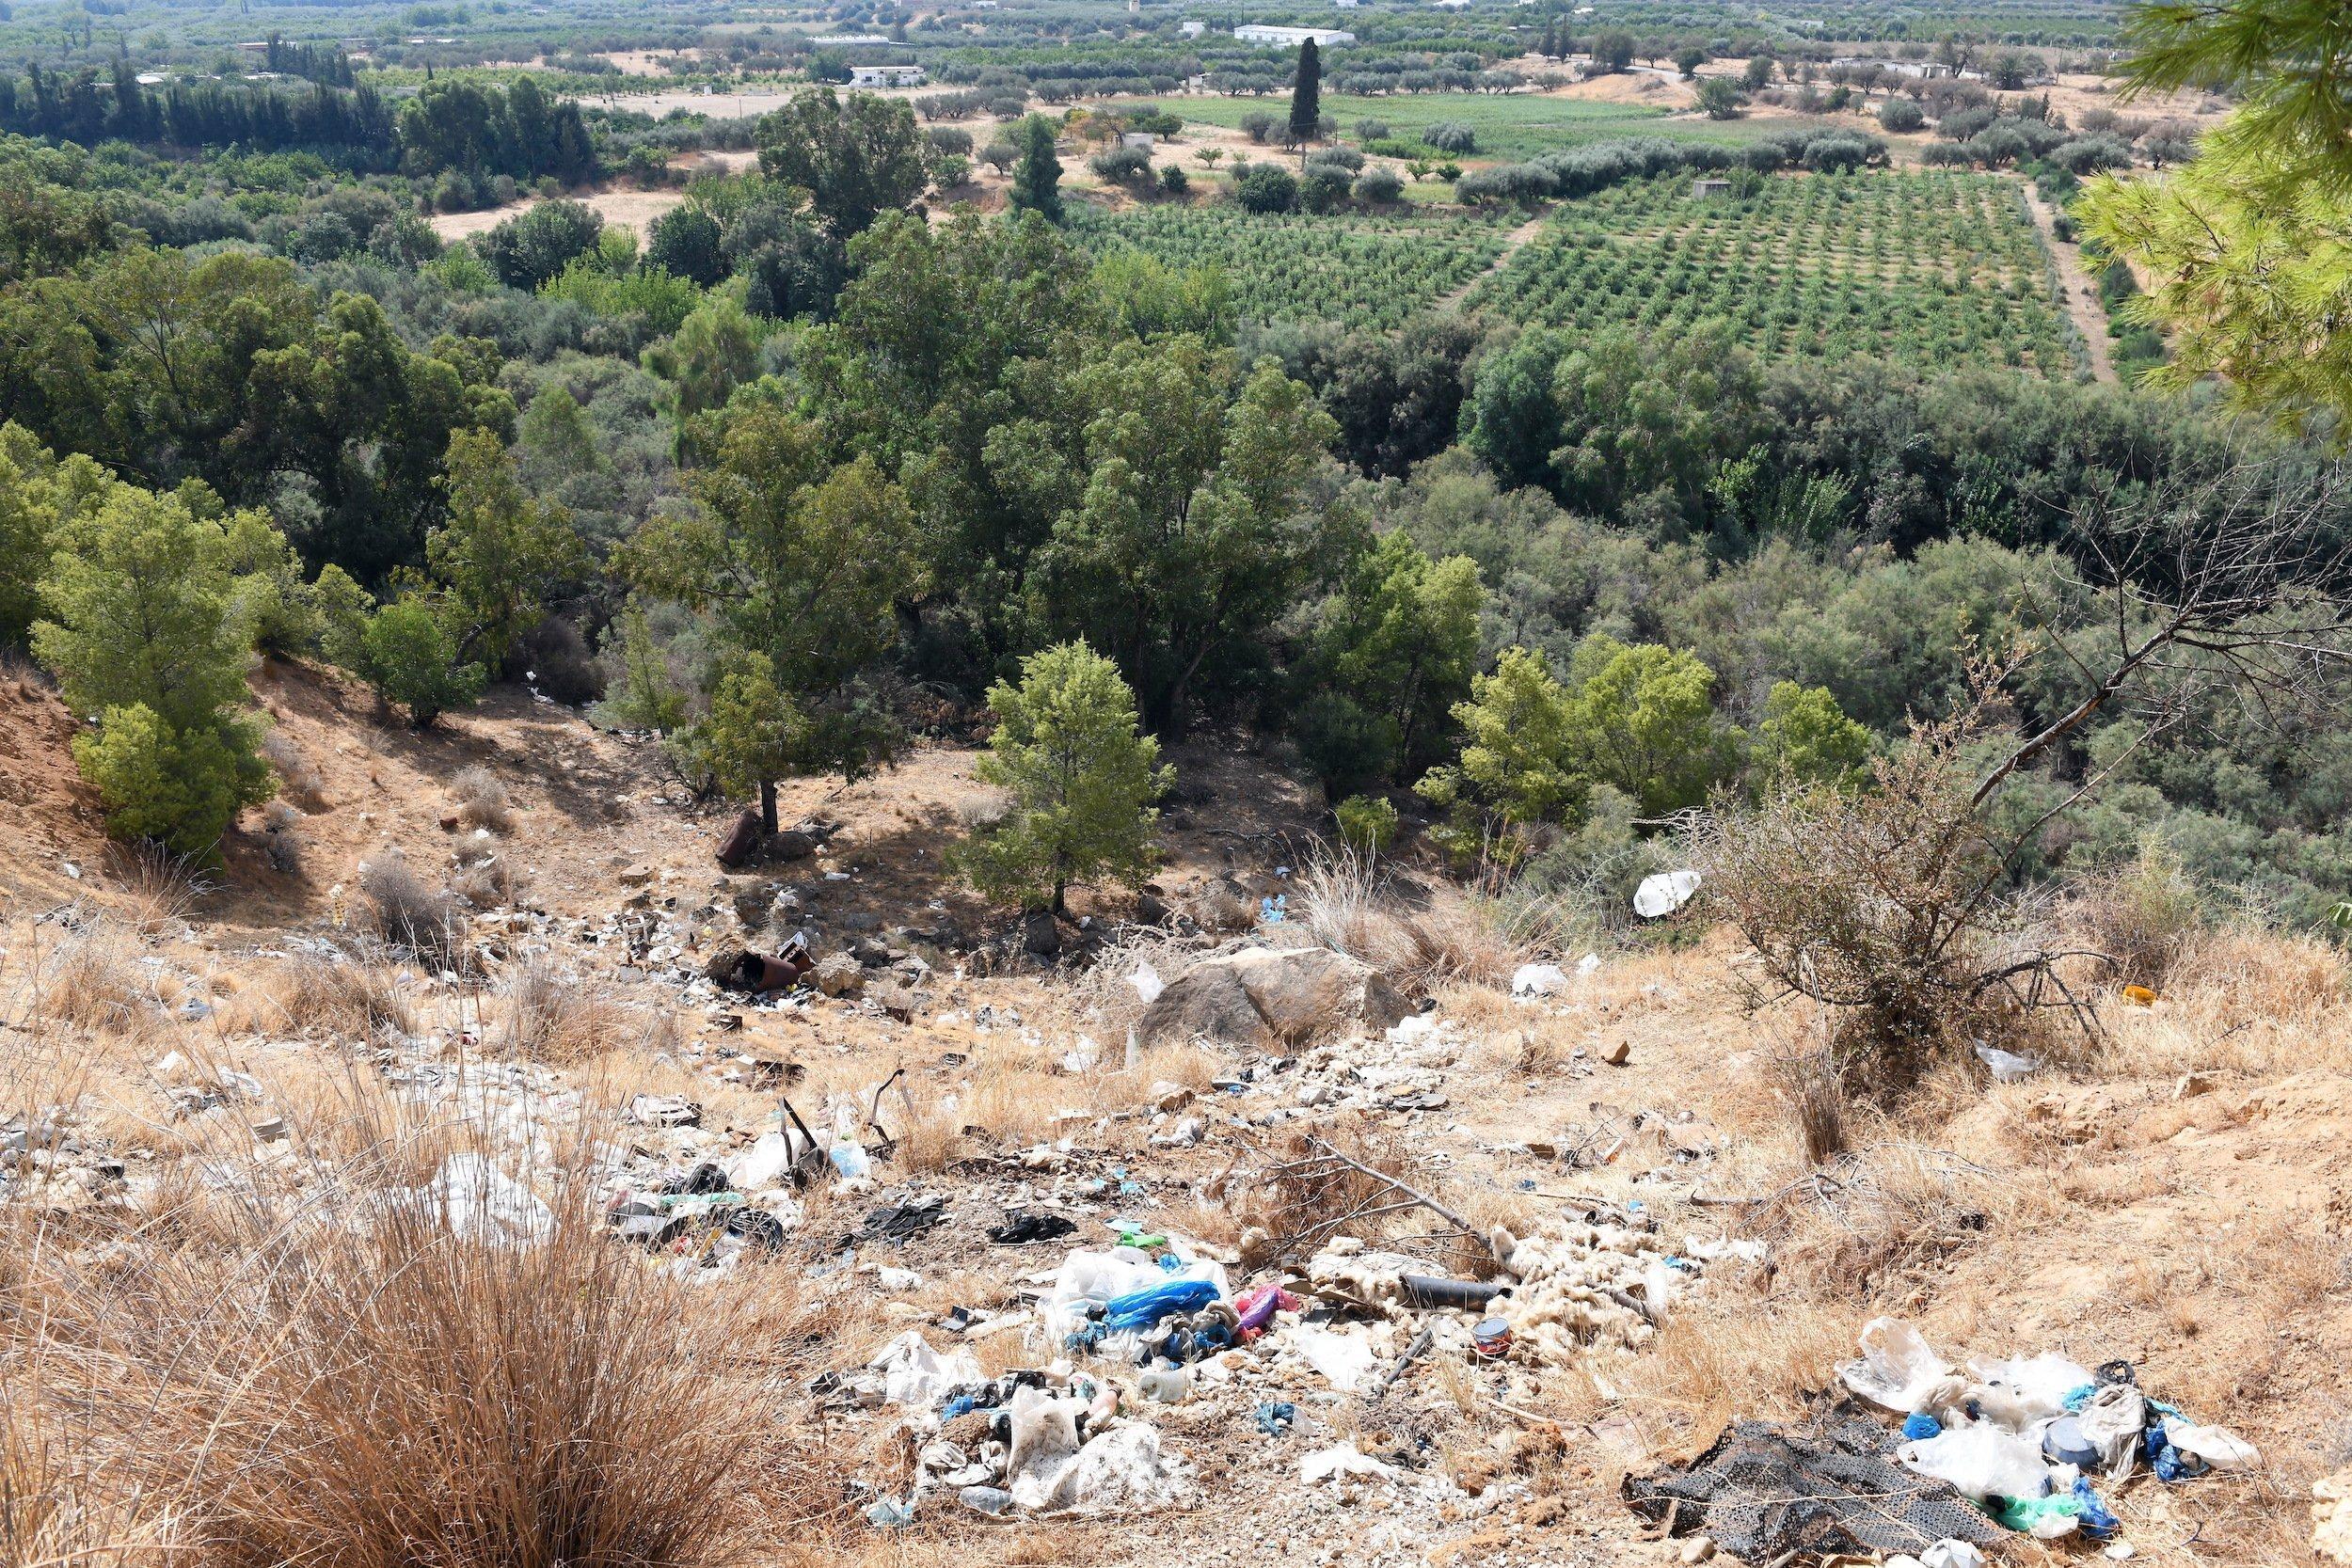 Illegal abgeladener Müll oberhalb des Flusses